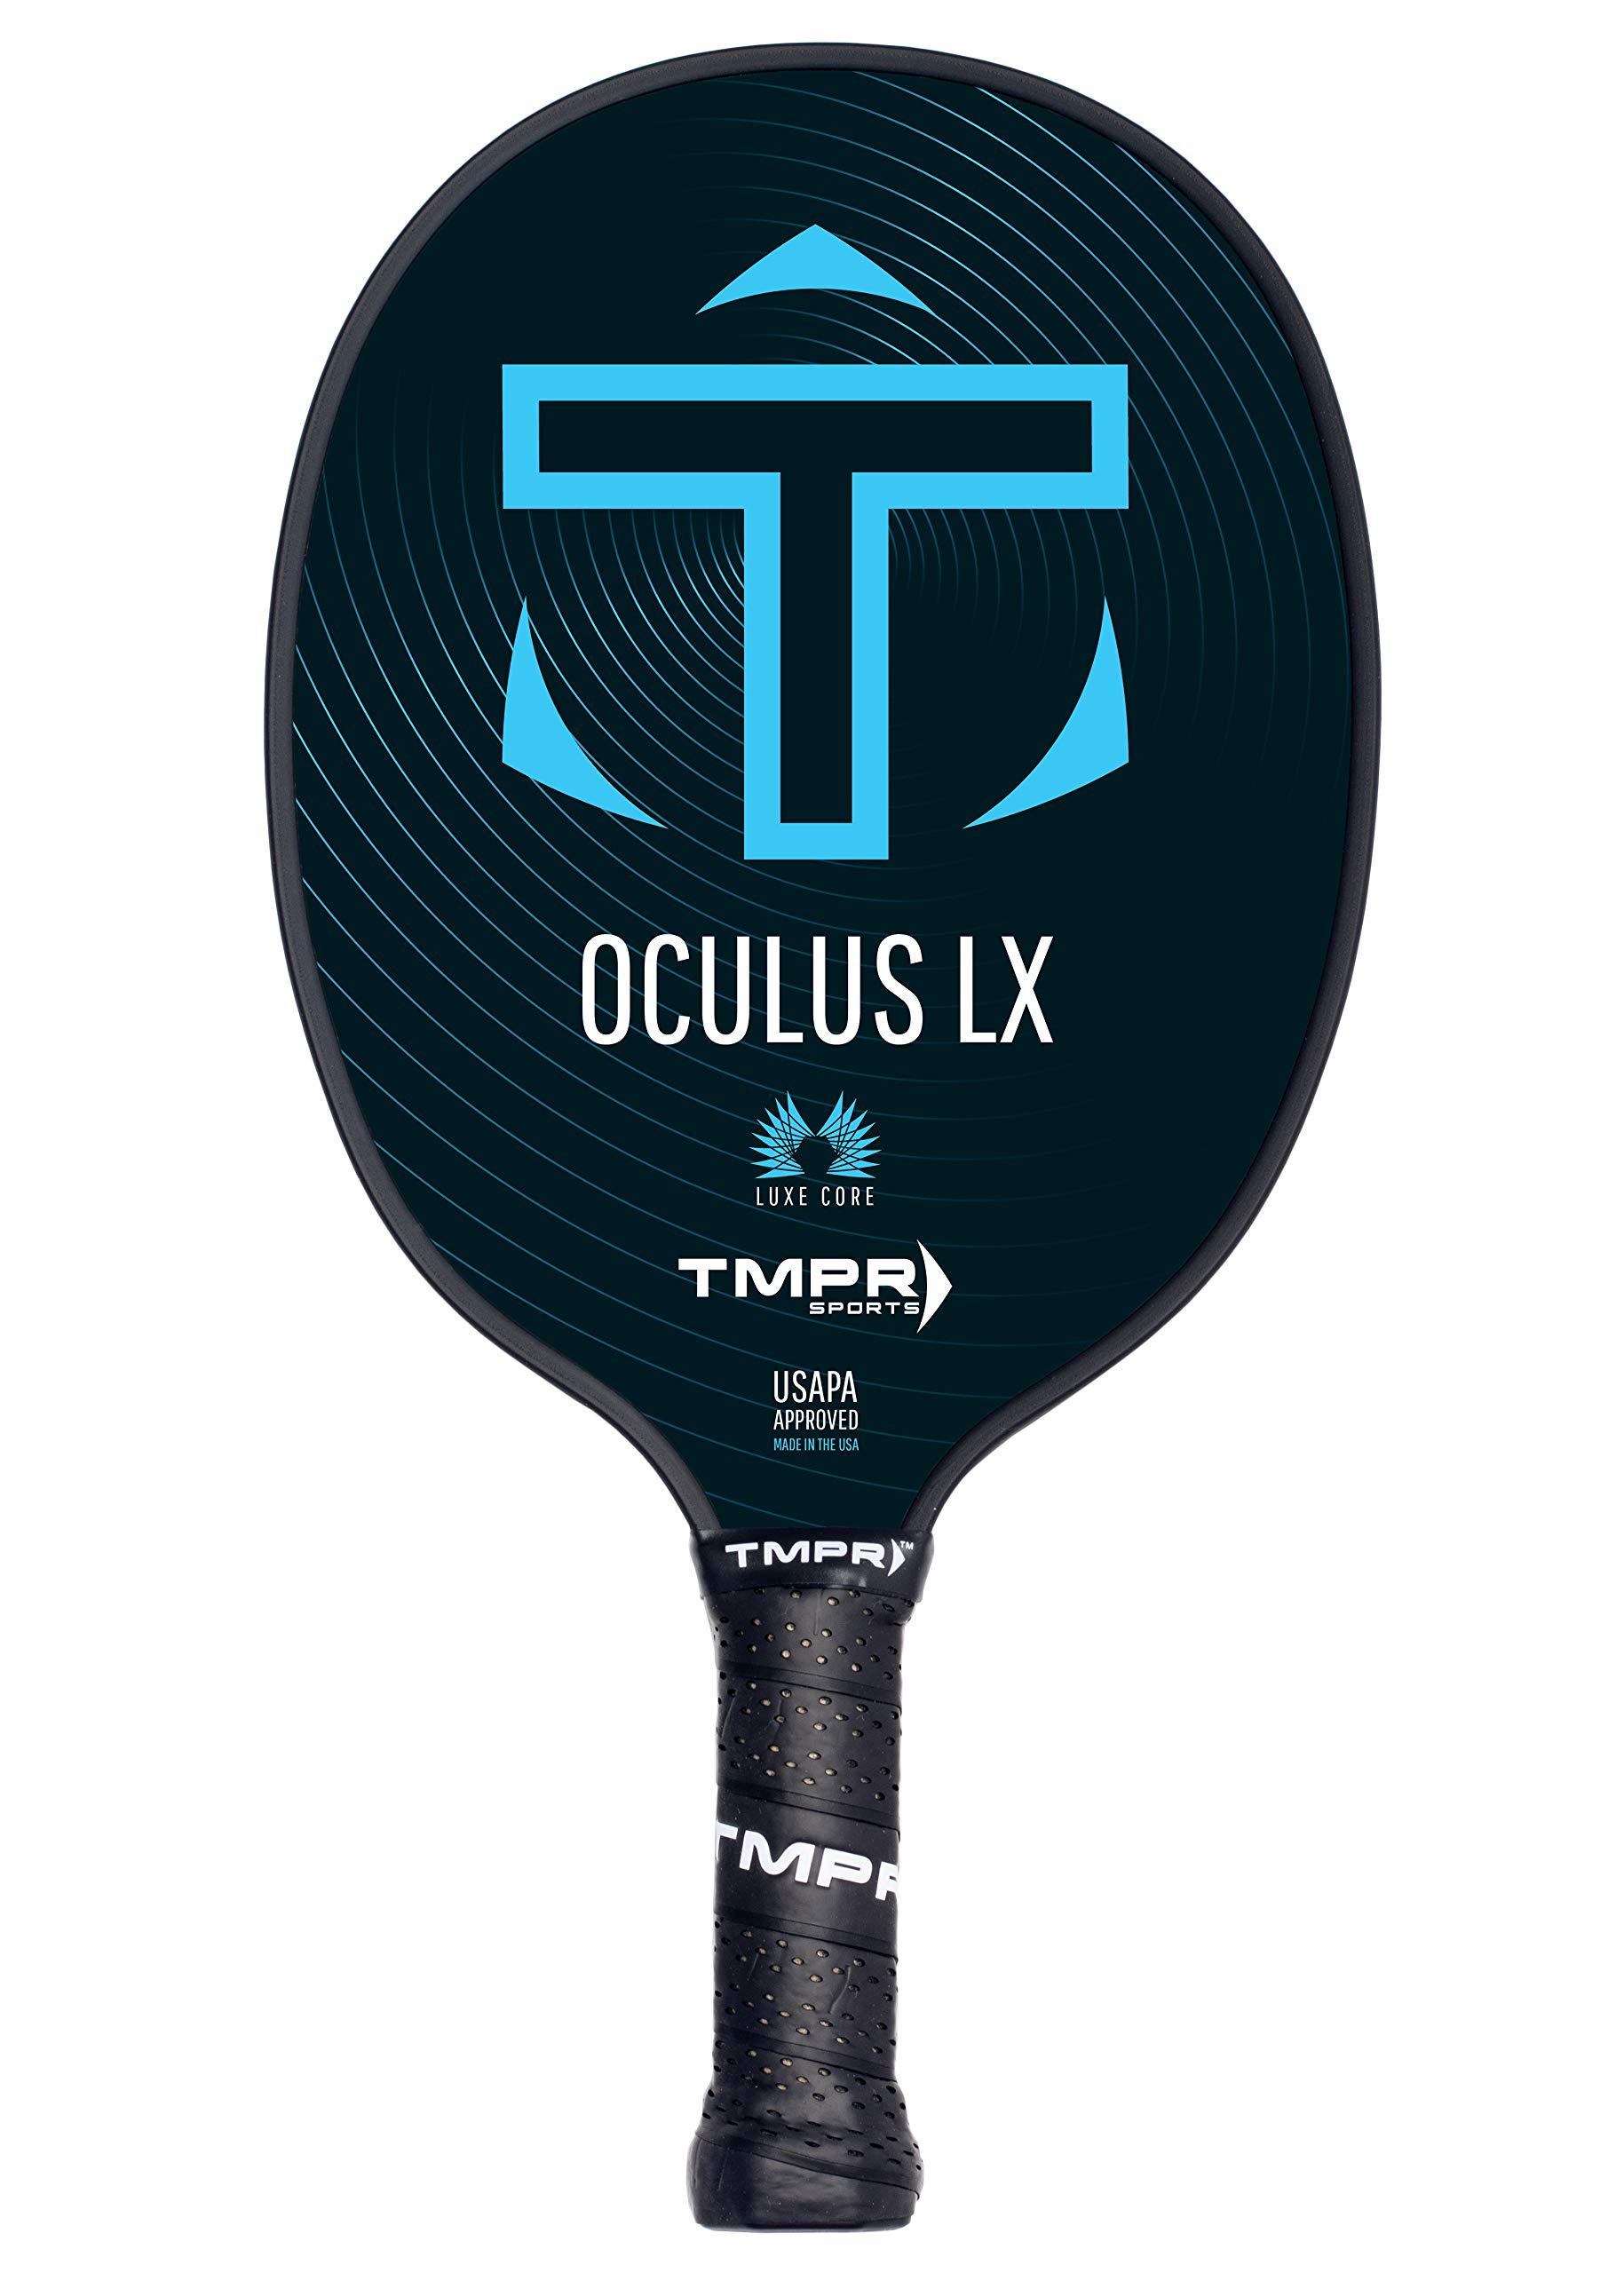 TMPR Sports > Oculus LX > High Performance Honeycomb P -VMH